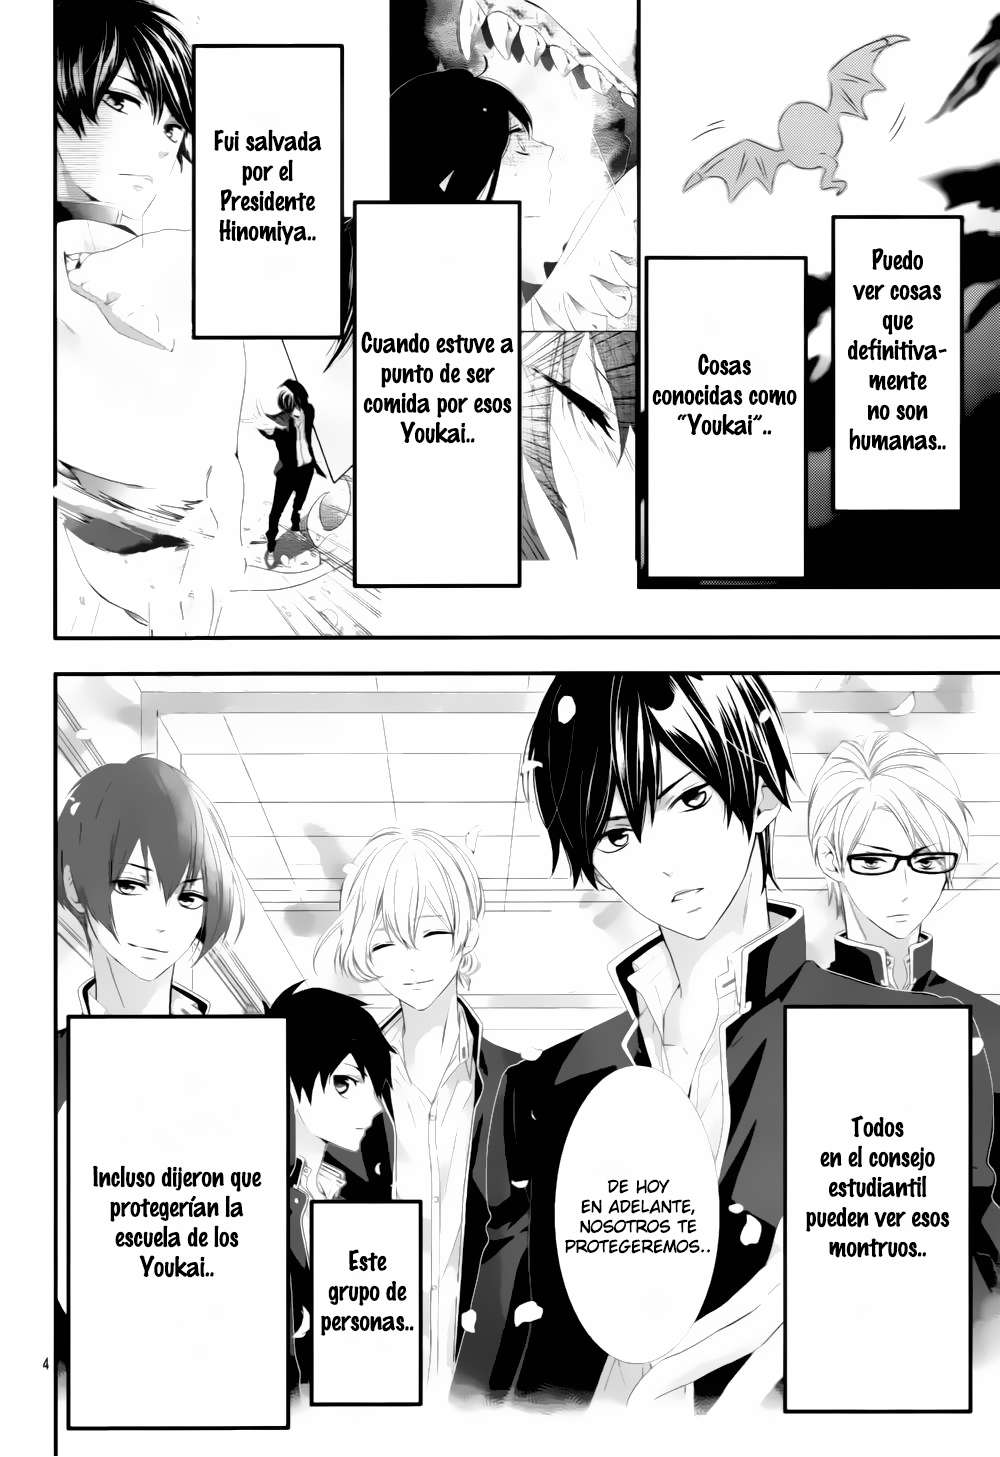 http://c5.ninemanga.com/es_manga/27/14875/363596/d9618ba726f62de721997196bb5619e5.jpg Page 6